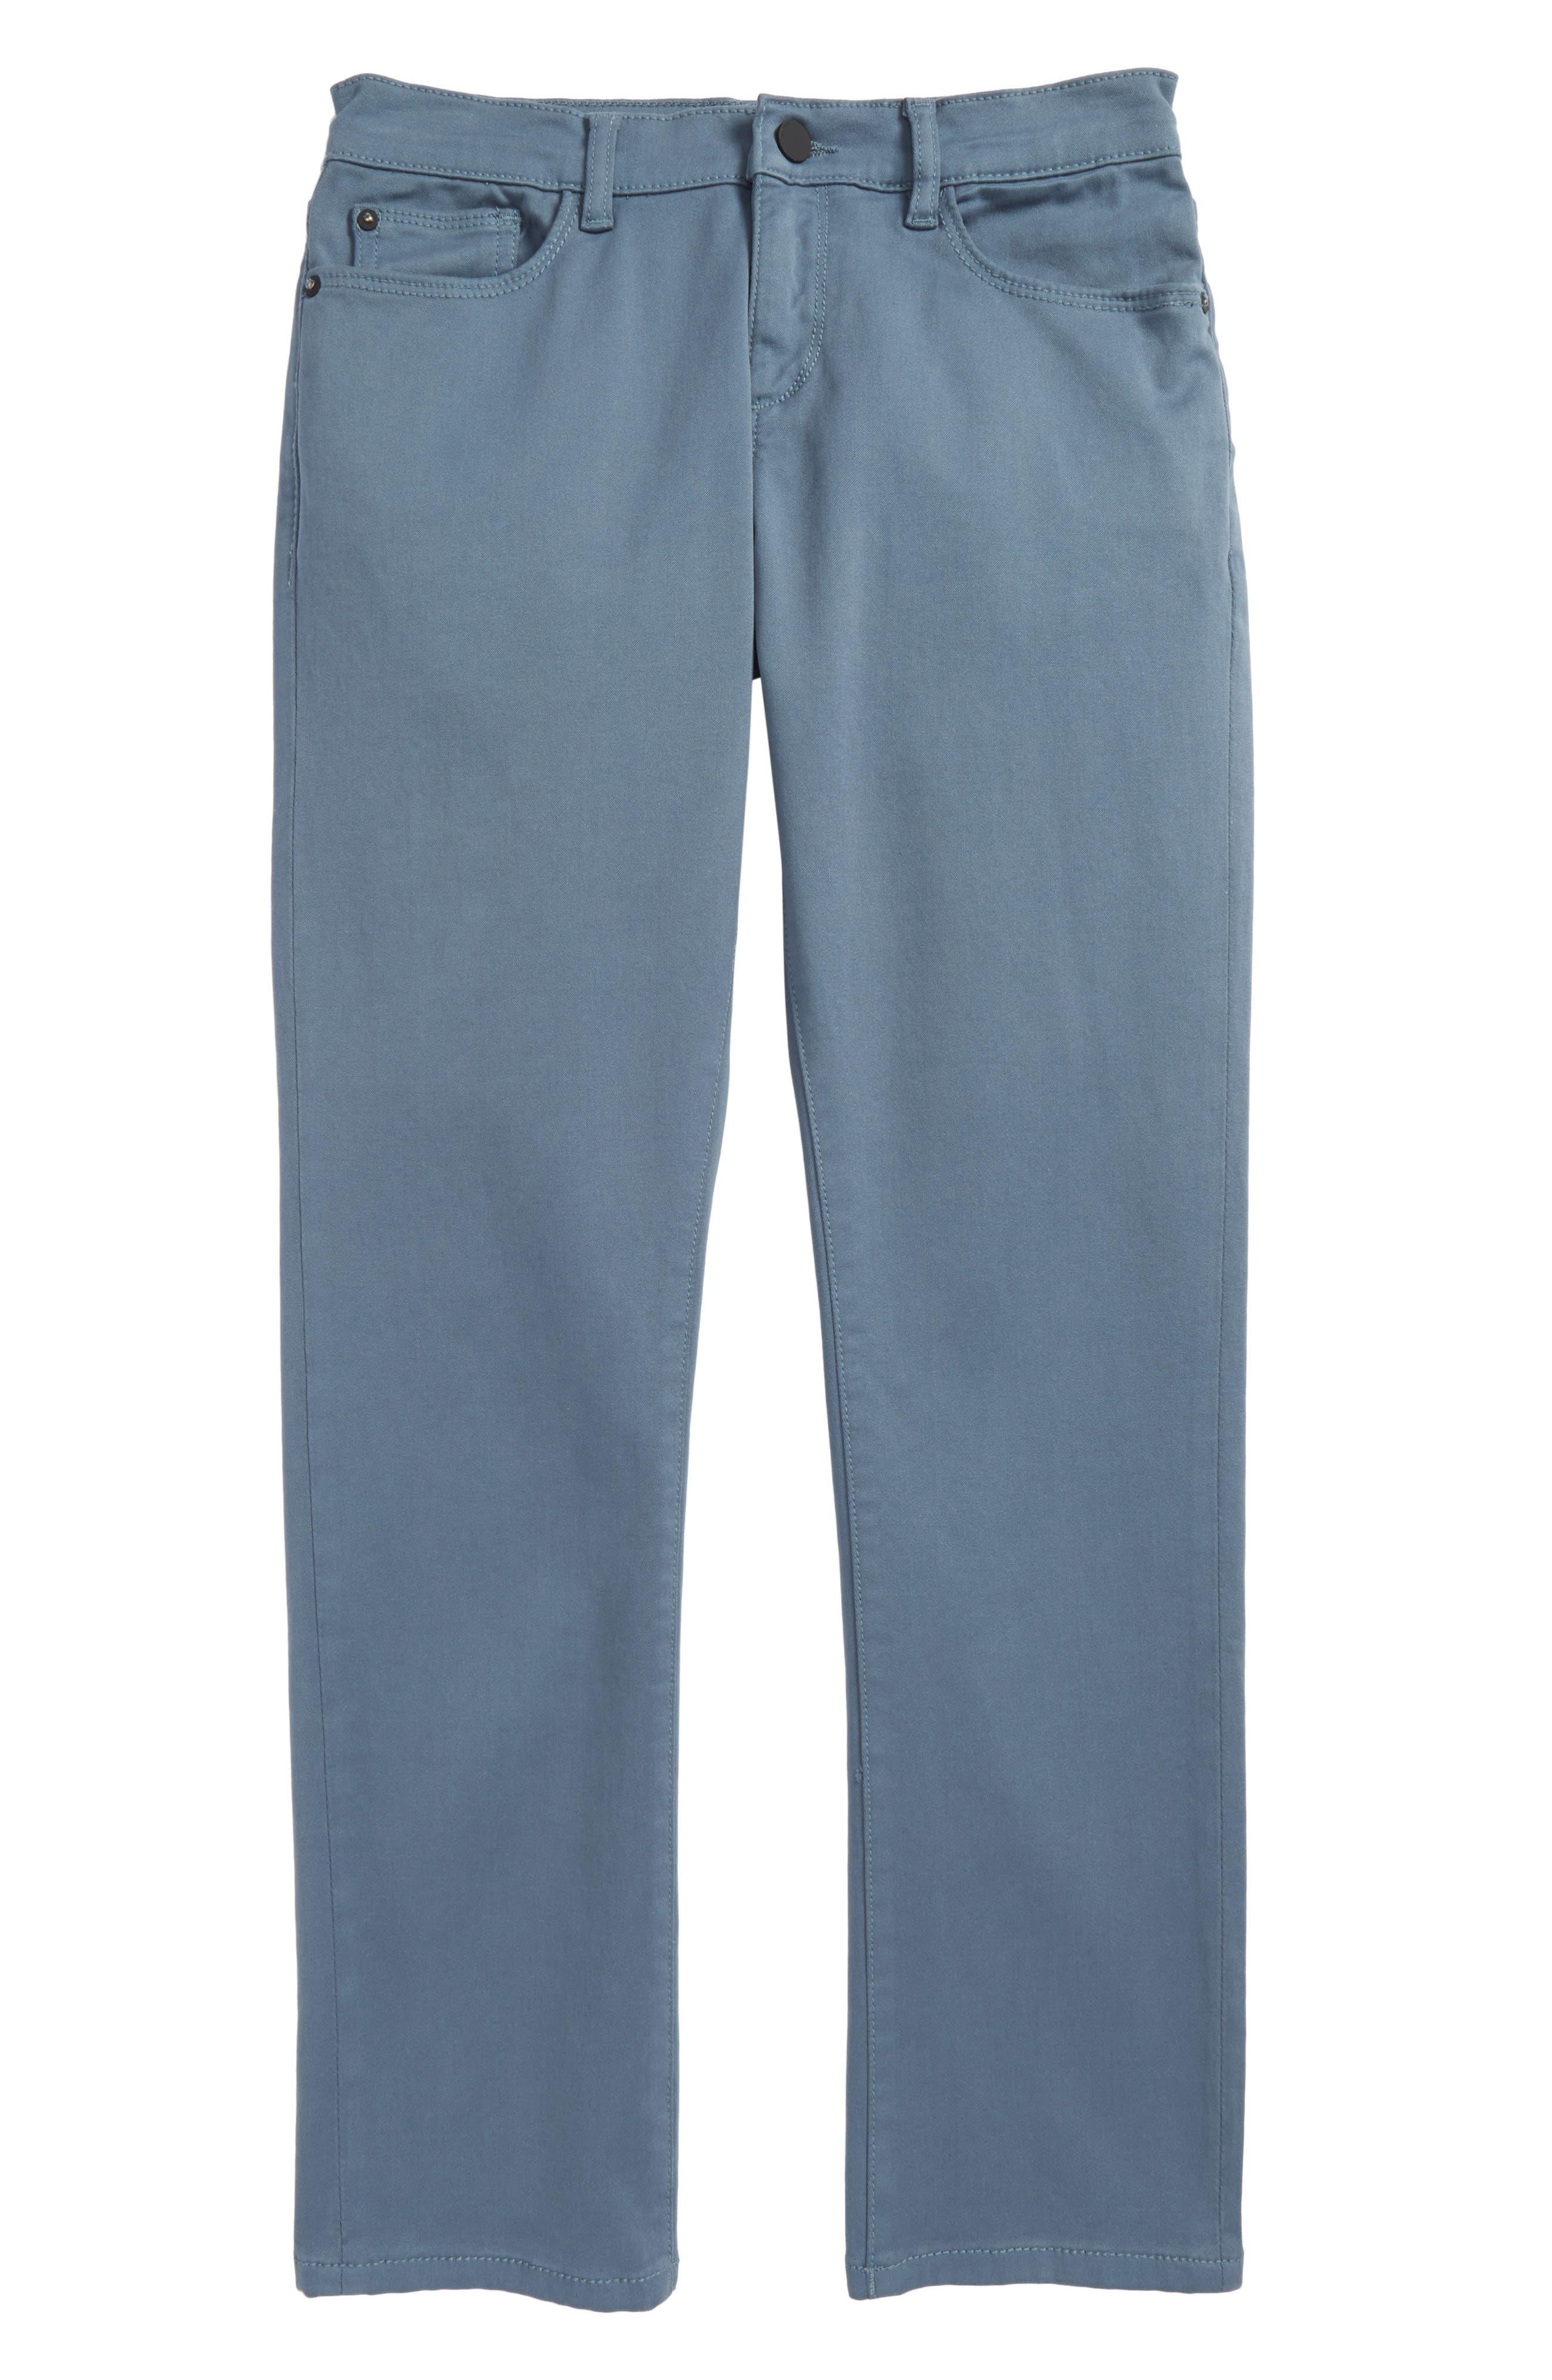 DL1961 Brady Slim Fit Twill Pants (Big Boys)